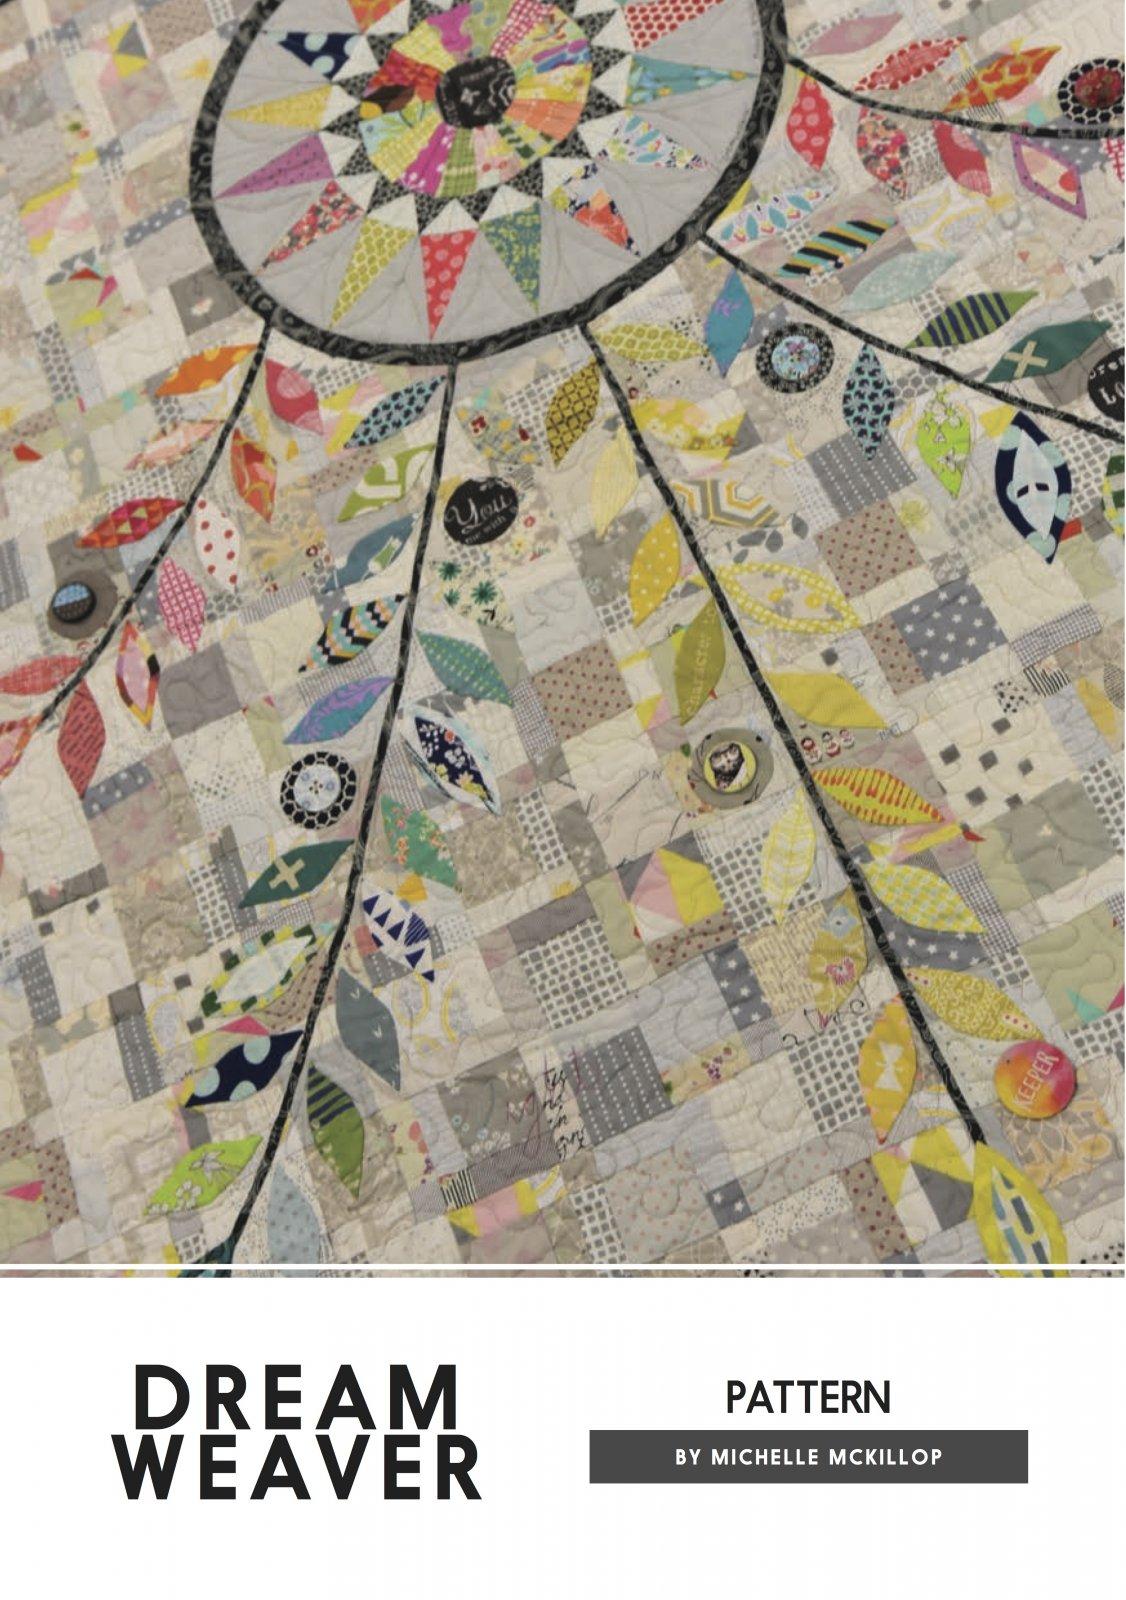 Dreamweaver Pattern by Michelle McKillop